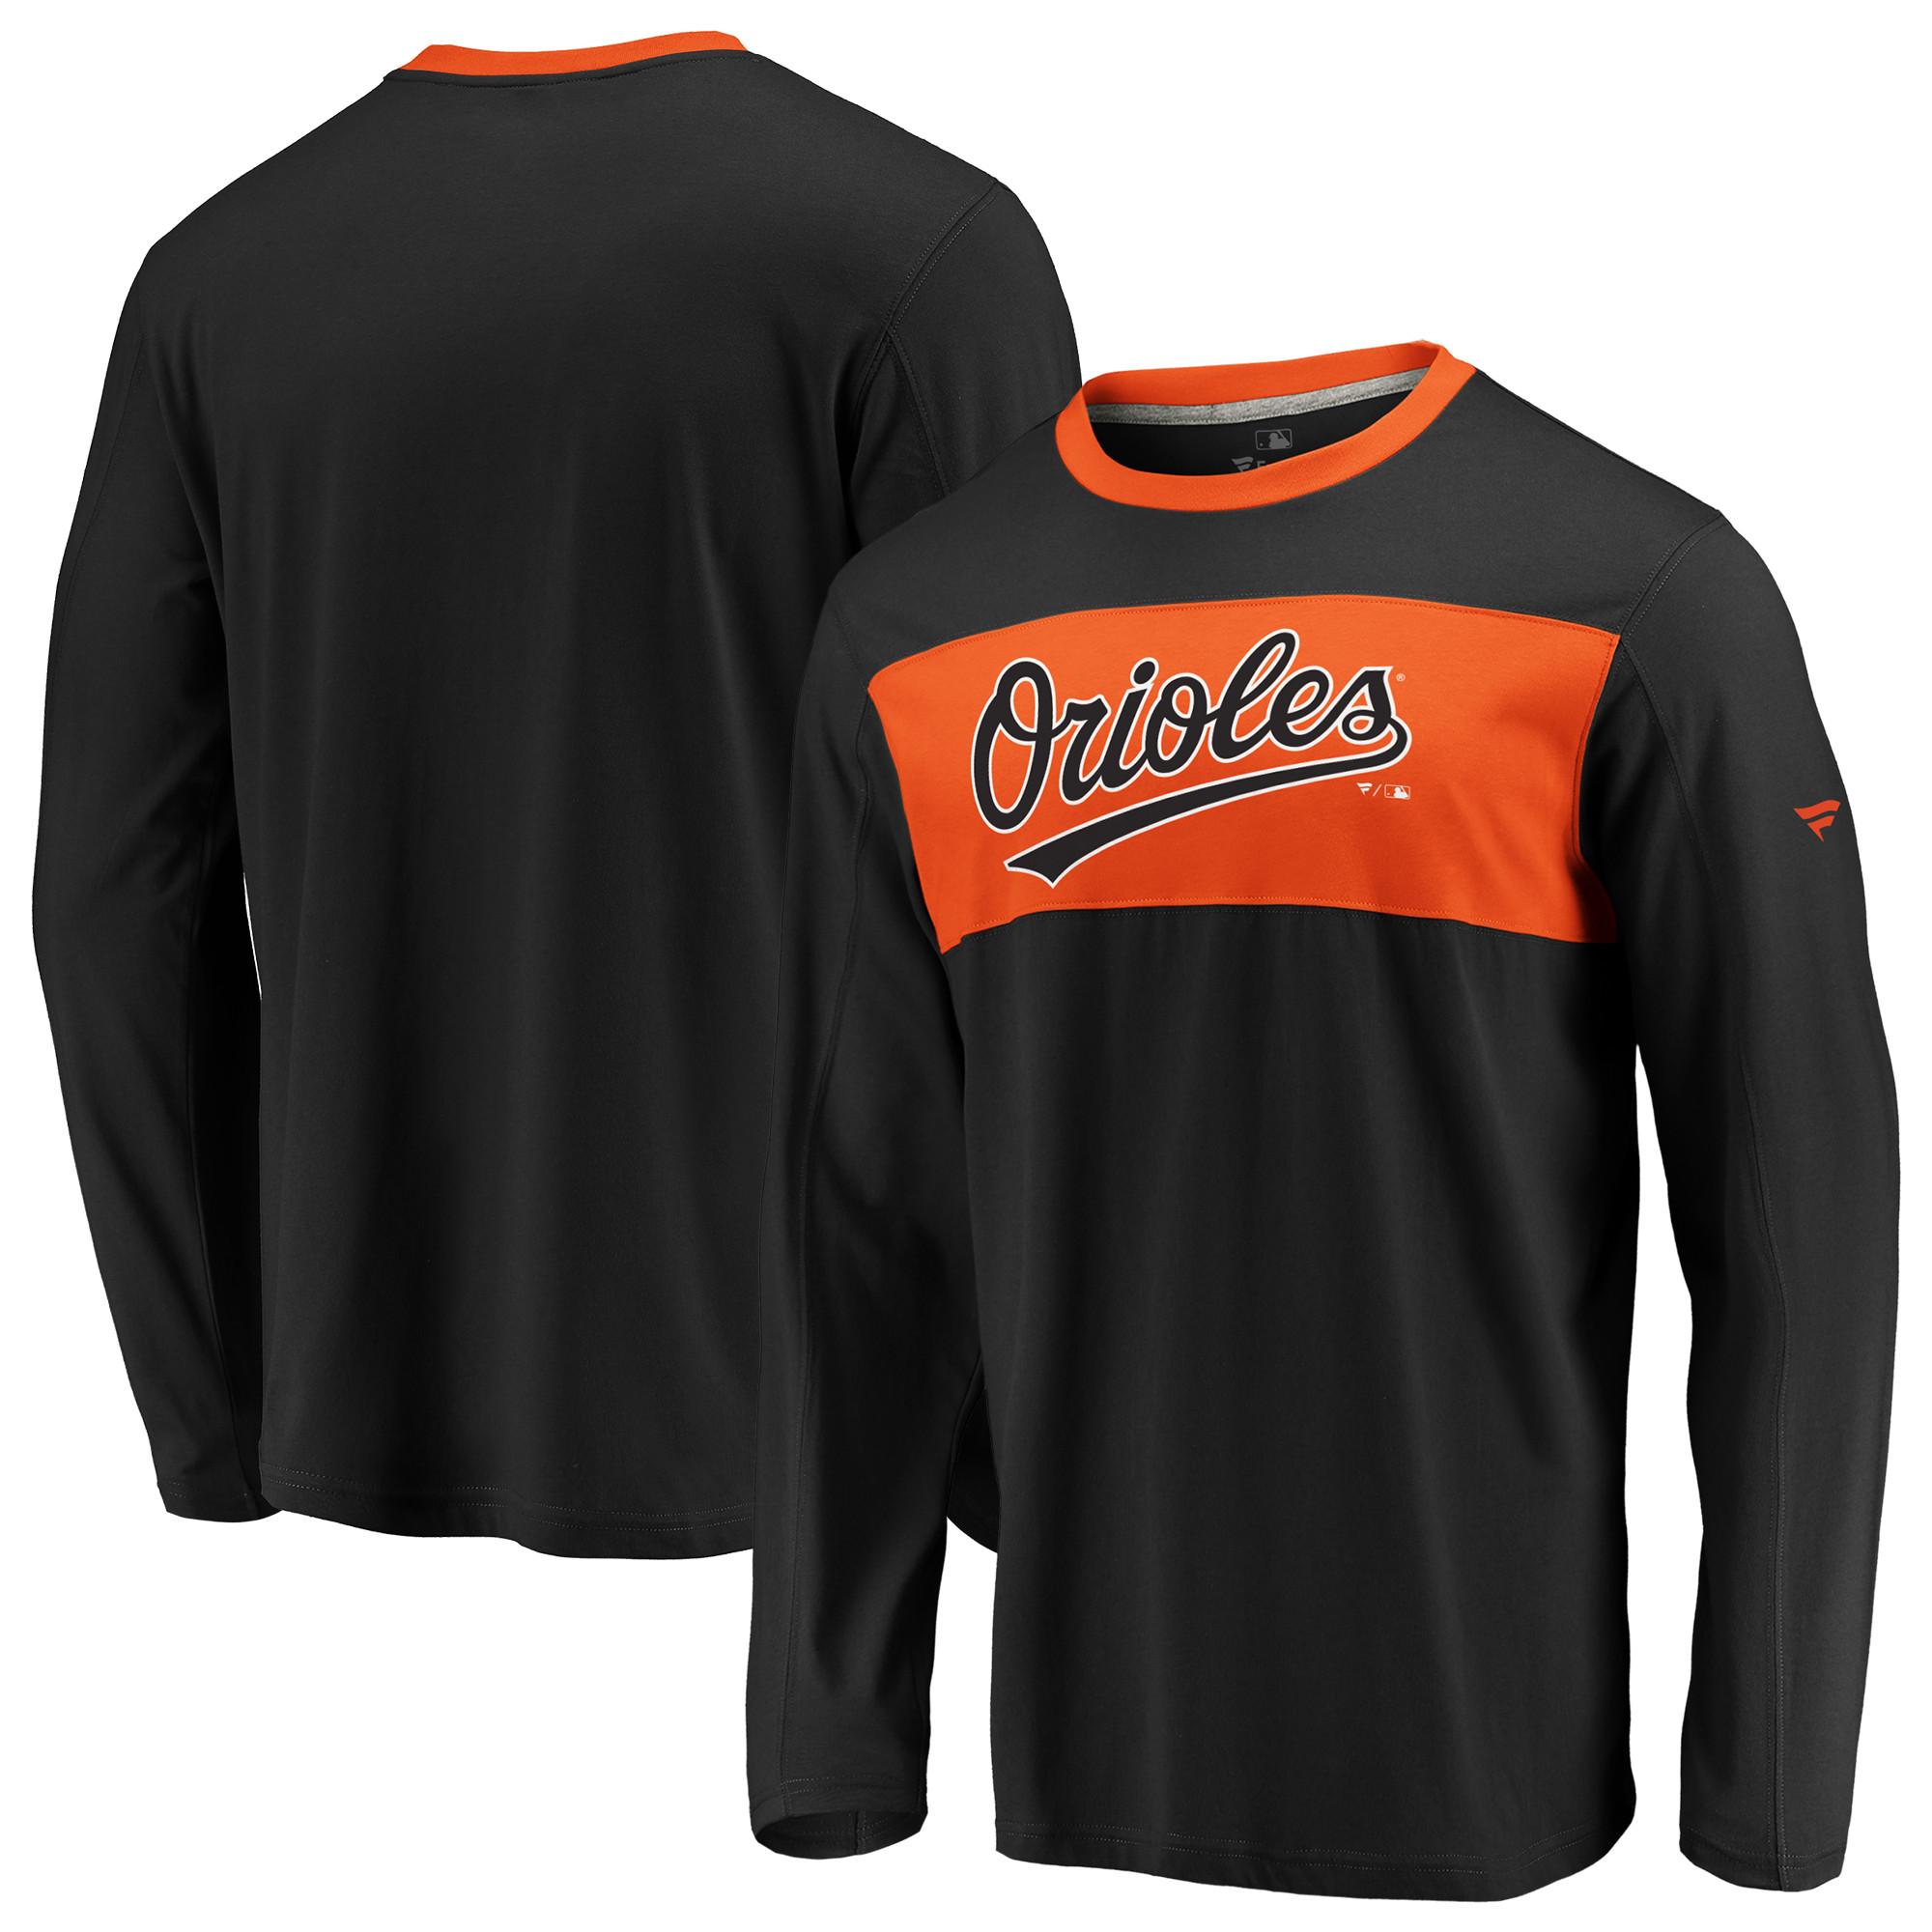 Baltimore Orioles Fanatics Branded Iconic Long Sleeve T-Shirt - Black/Orange